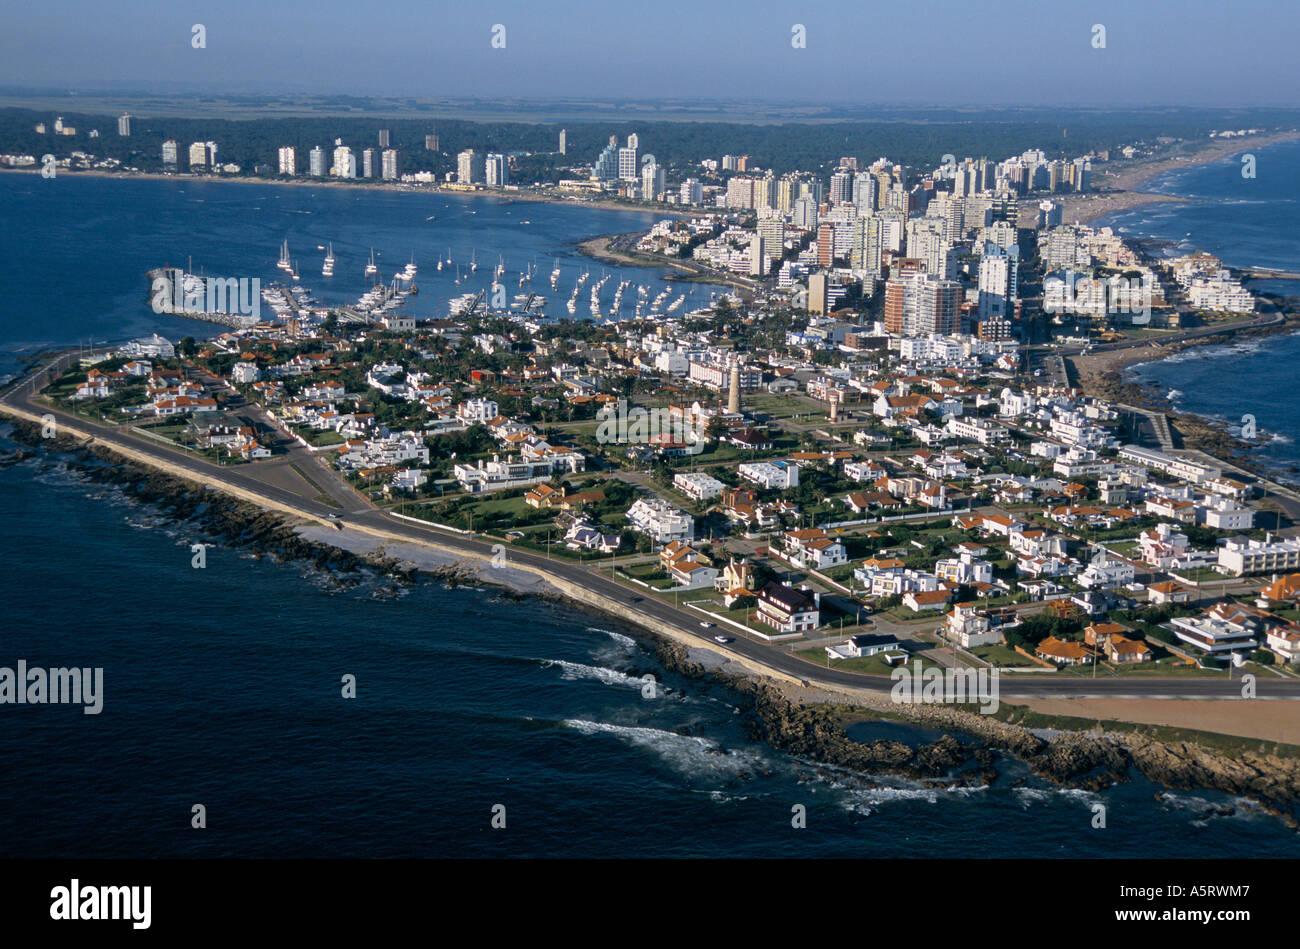 THE EXCLUSIVE RESORT OF PUNTA DEL ESTE, URUGUAY. SOUTH AMERICA'S ANSWER TO MARBELLA OR ST TROPEZ - Stock Image